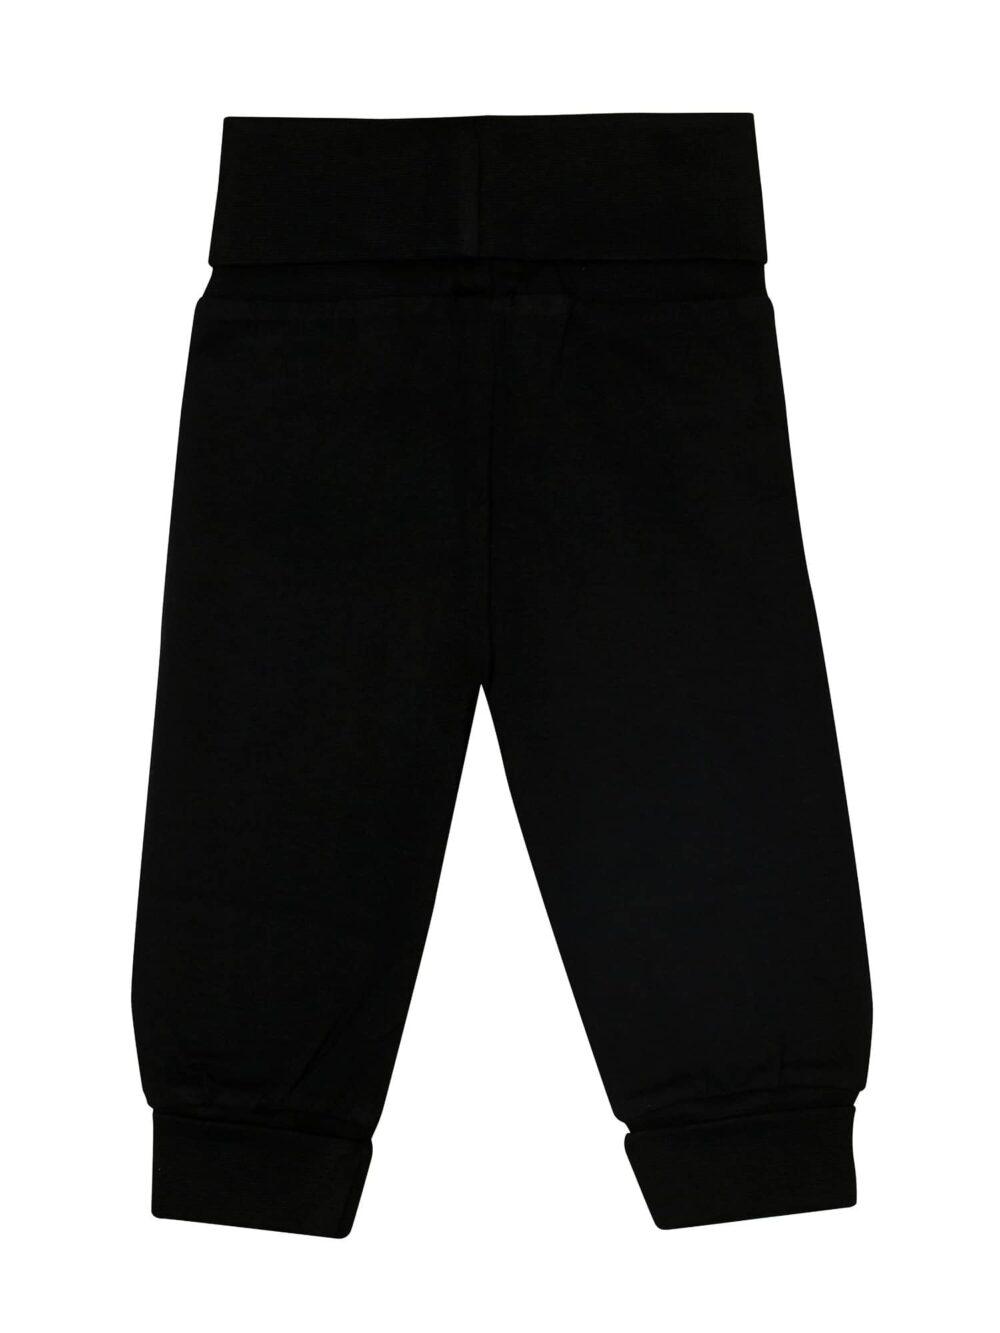 Kids Up Baby Ternet Ninja Buks Black